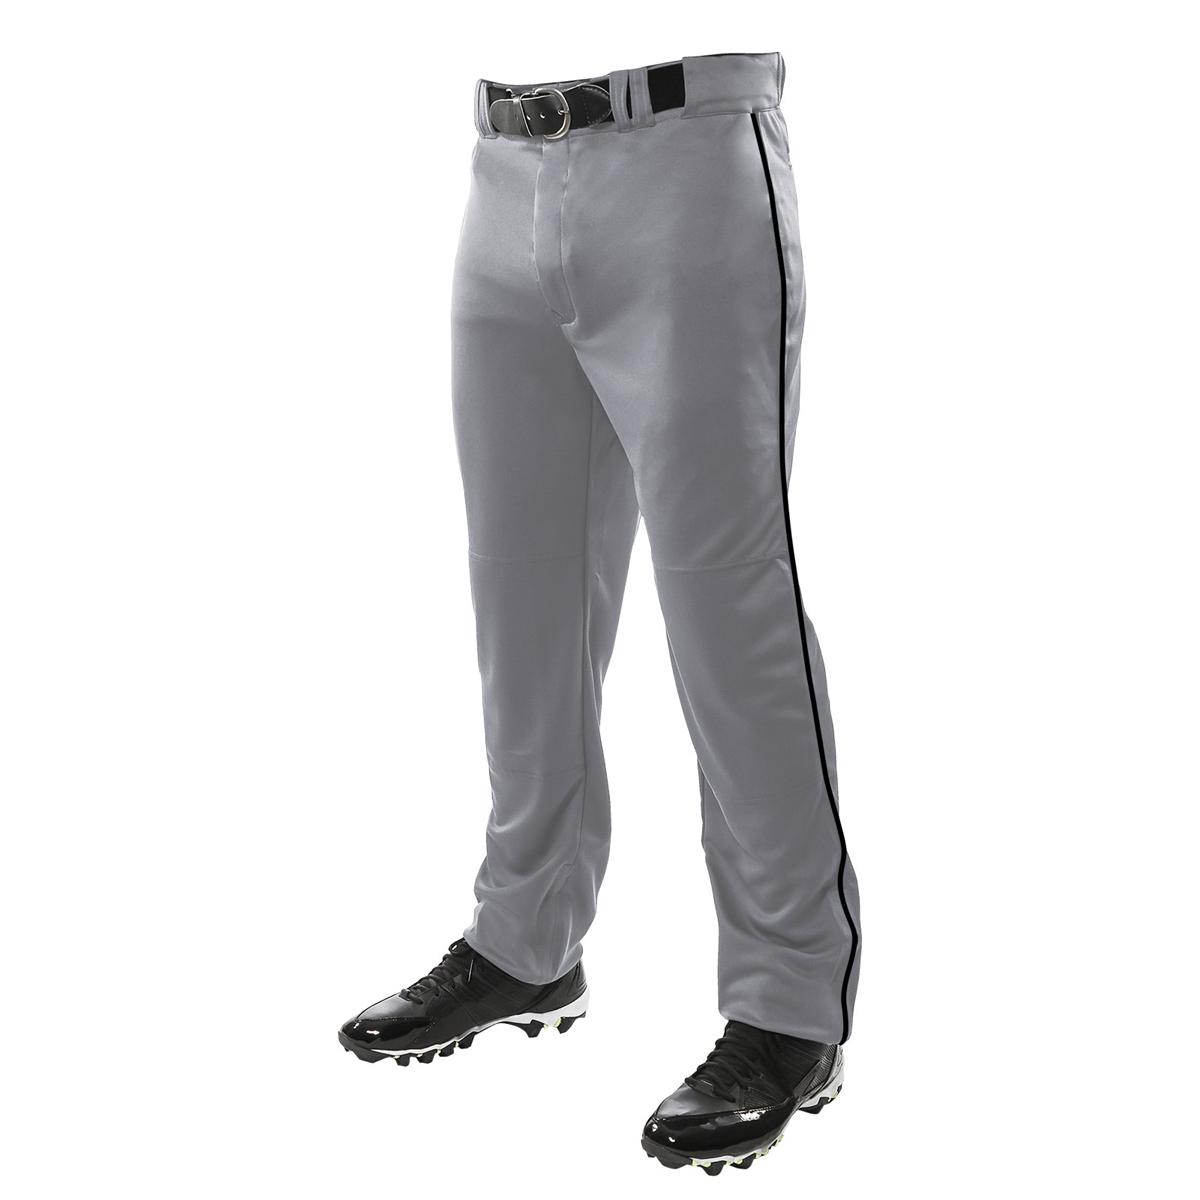 CHAMPRO Unisex-Youth Straight Pants